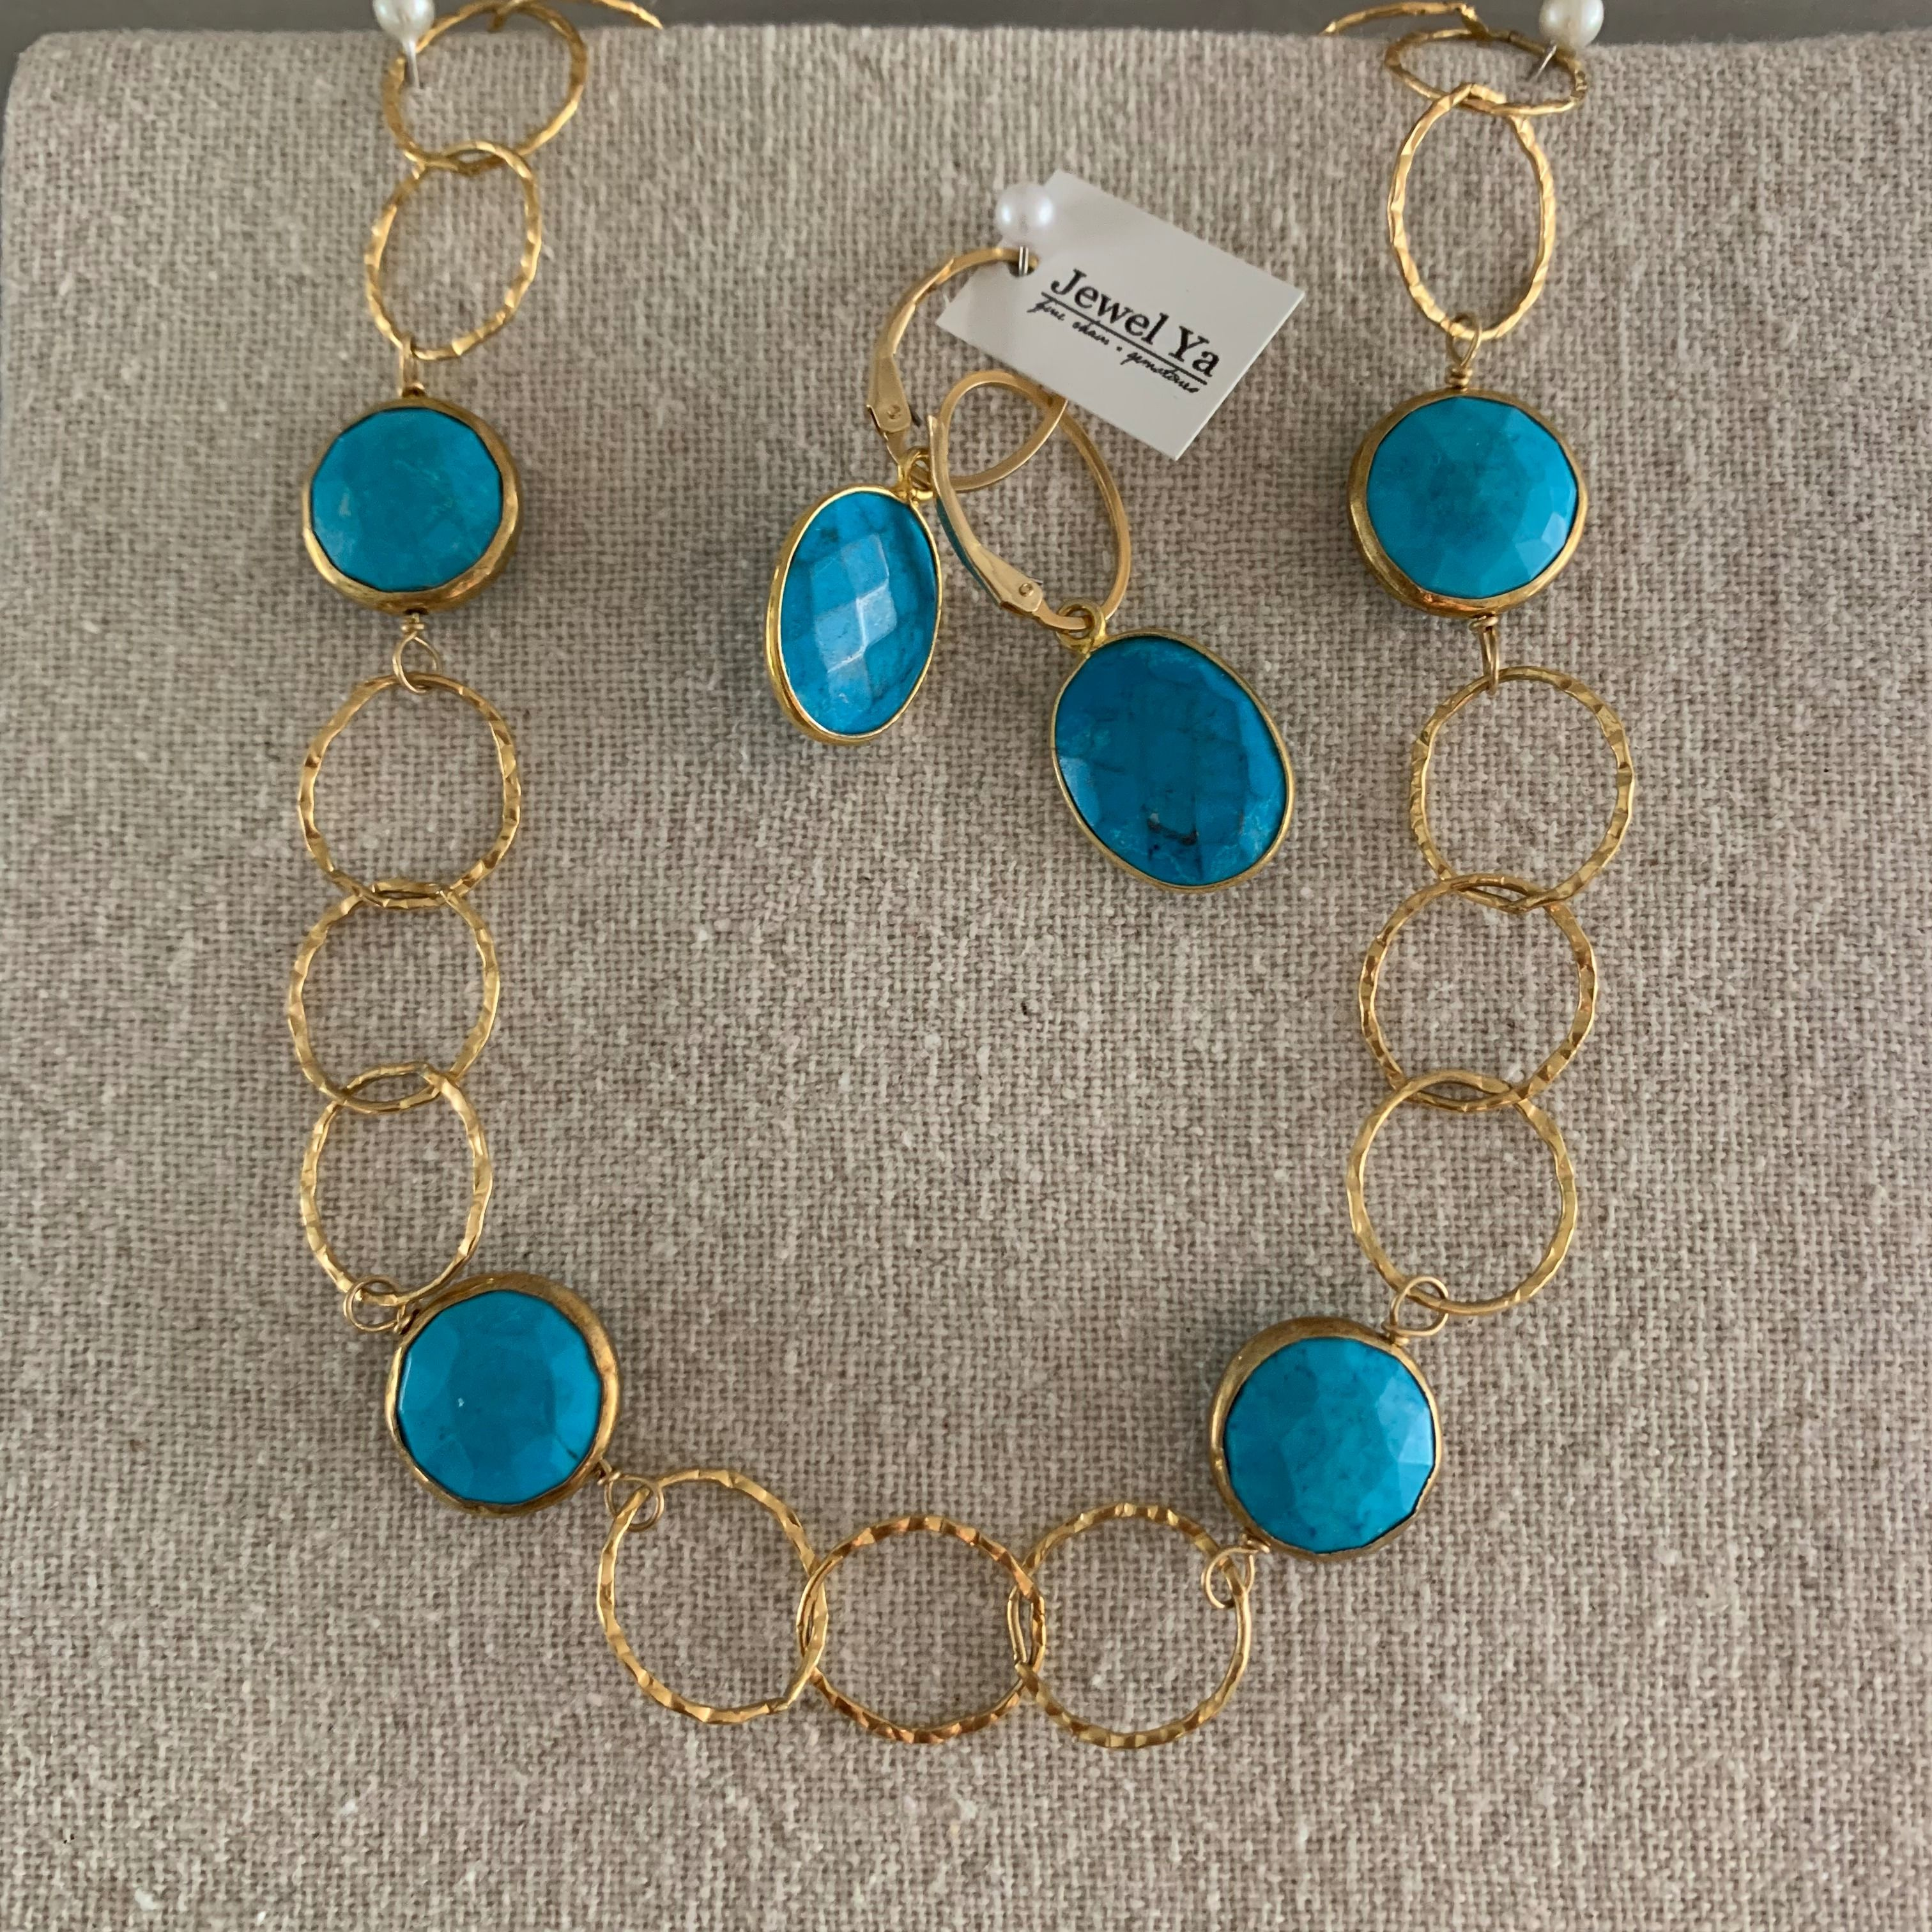 Turquoise Jewelry Set Turquoise Jewelry Set Natural Turquoise Jewelry Jewelry